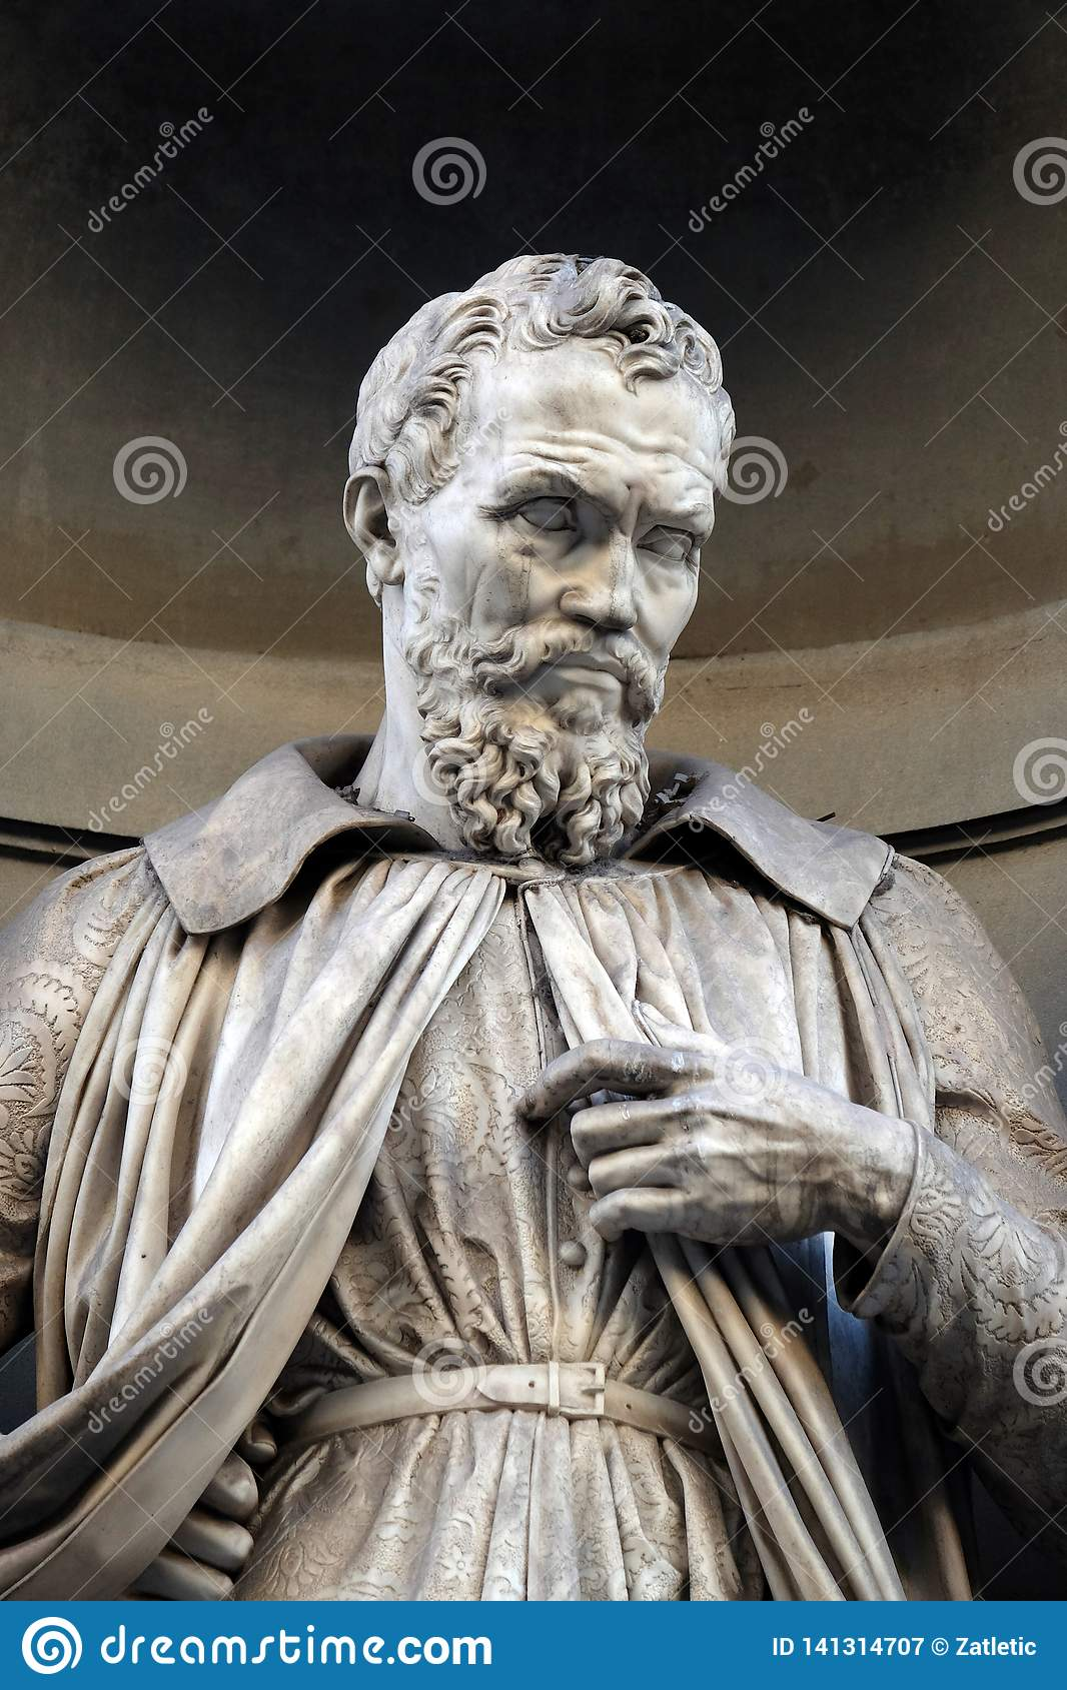 Michelangelo Buonarroti, statua w niszach Uffizi kolumnada w Florencja